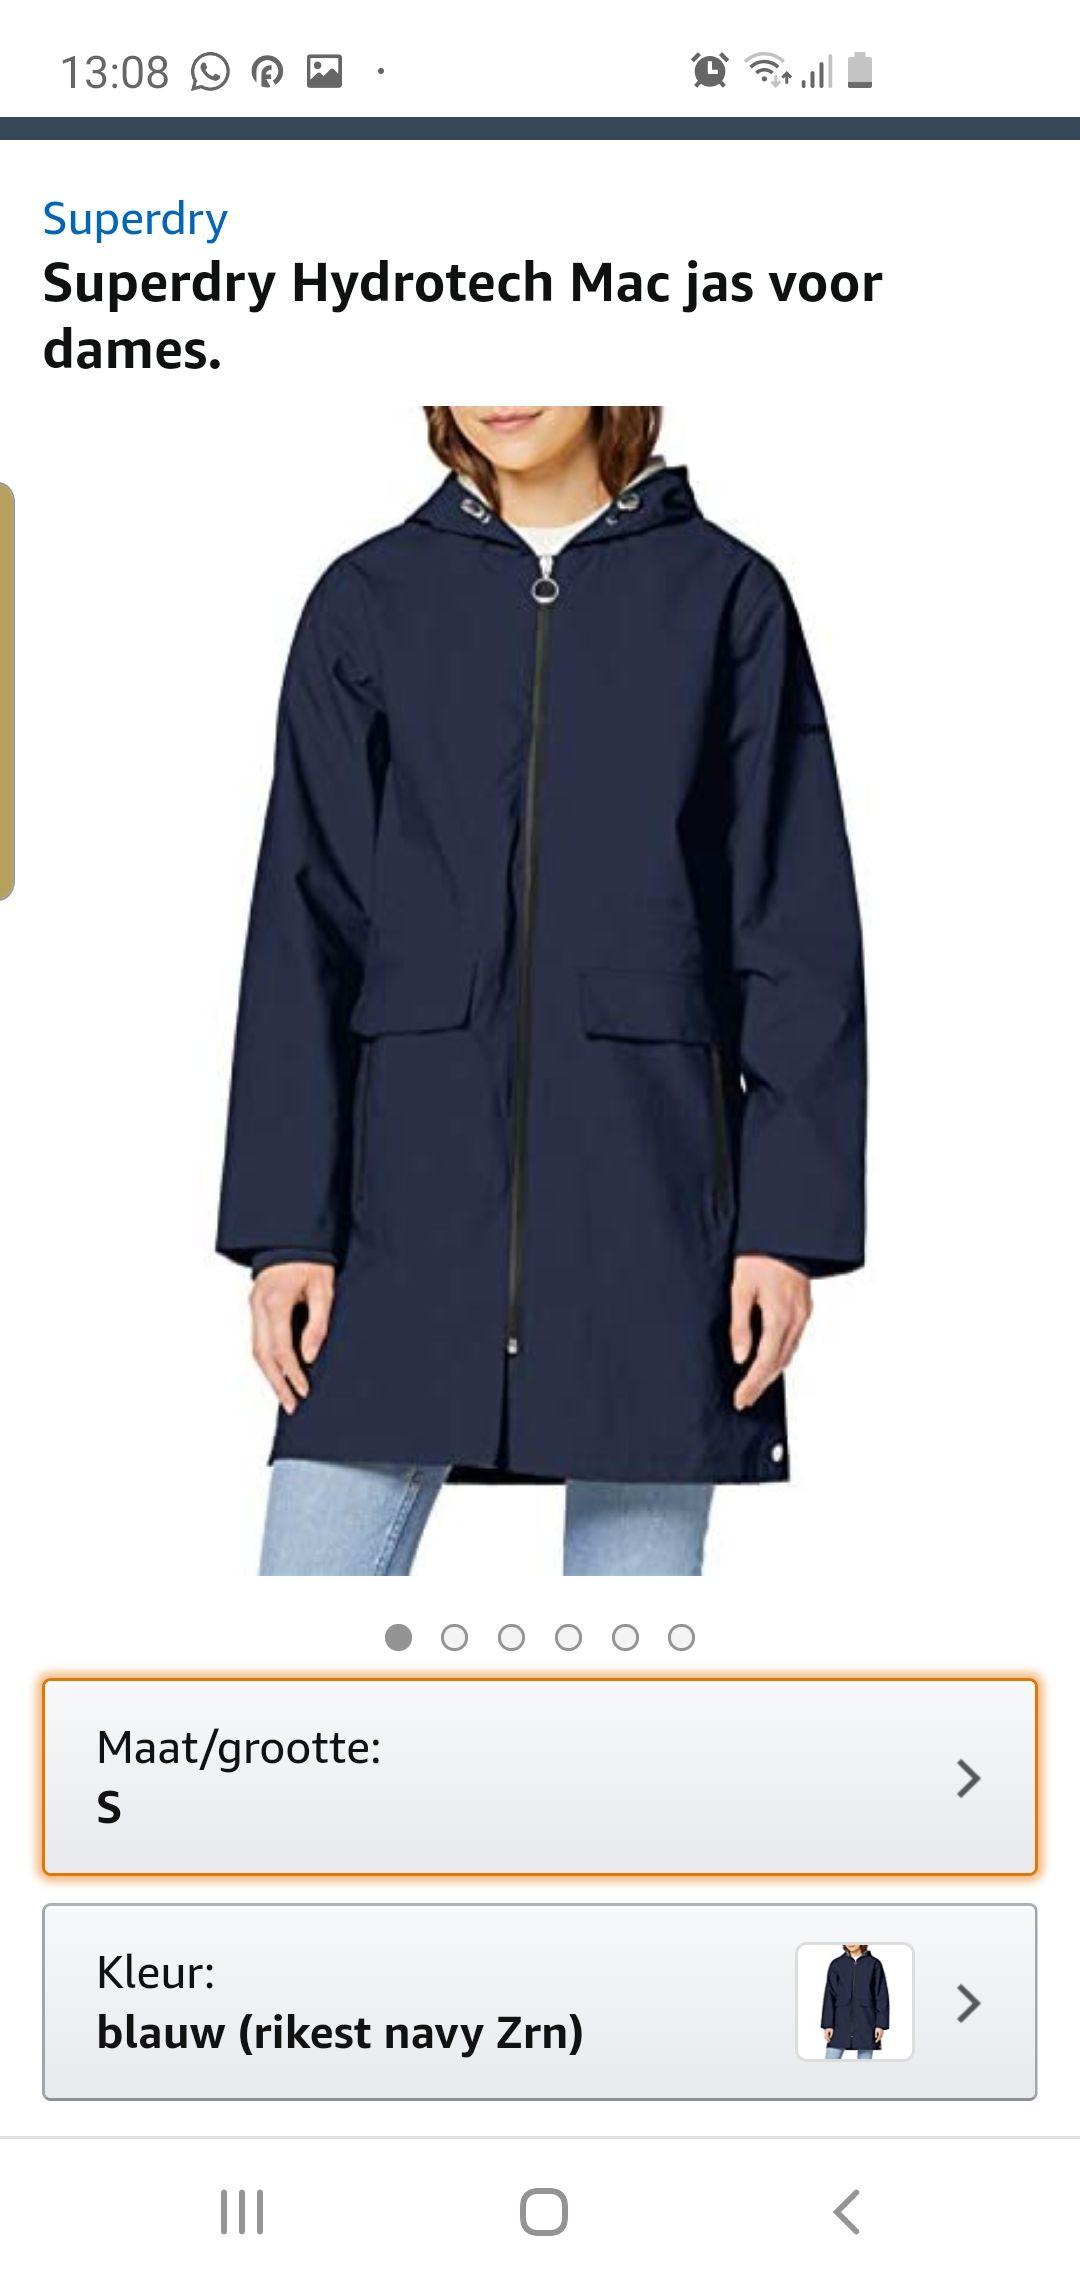 Superdry Hydrotech Mac jas voor dames